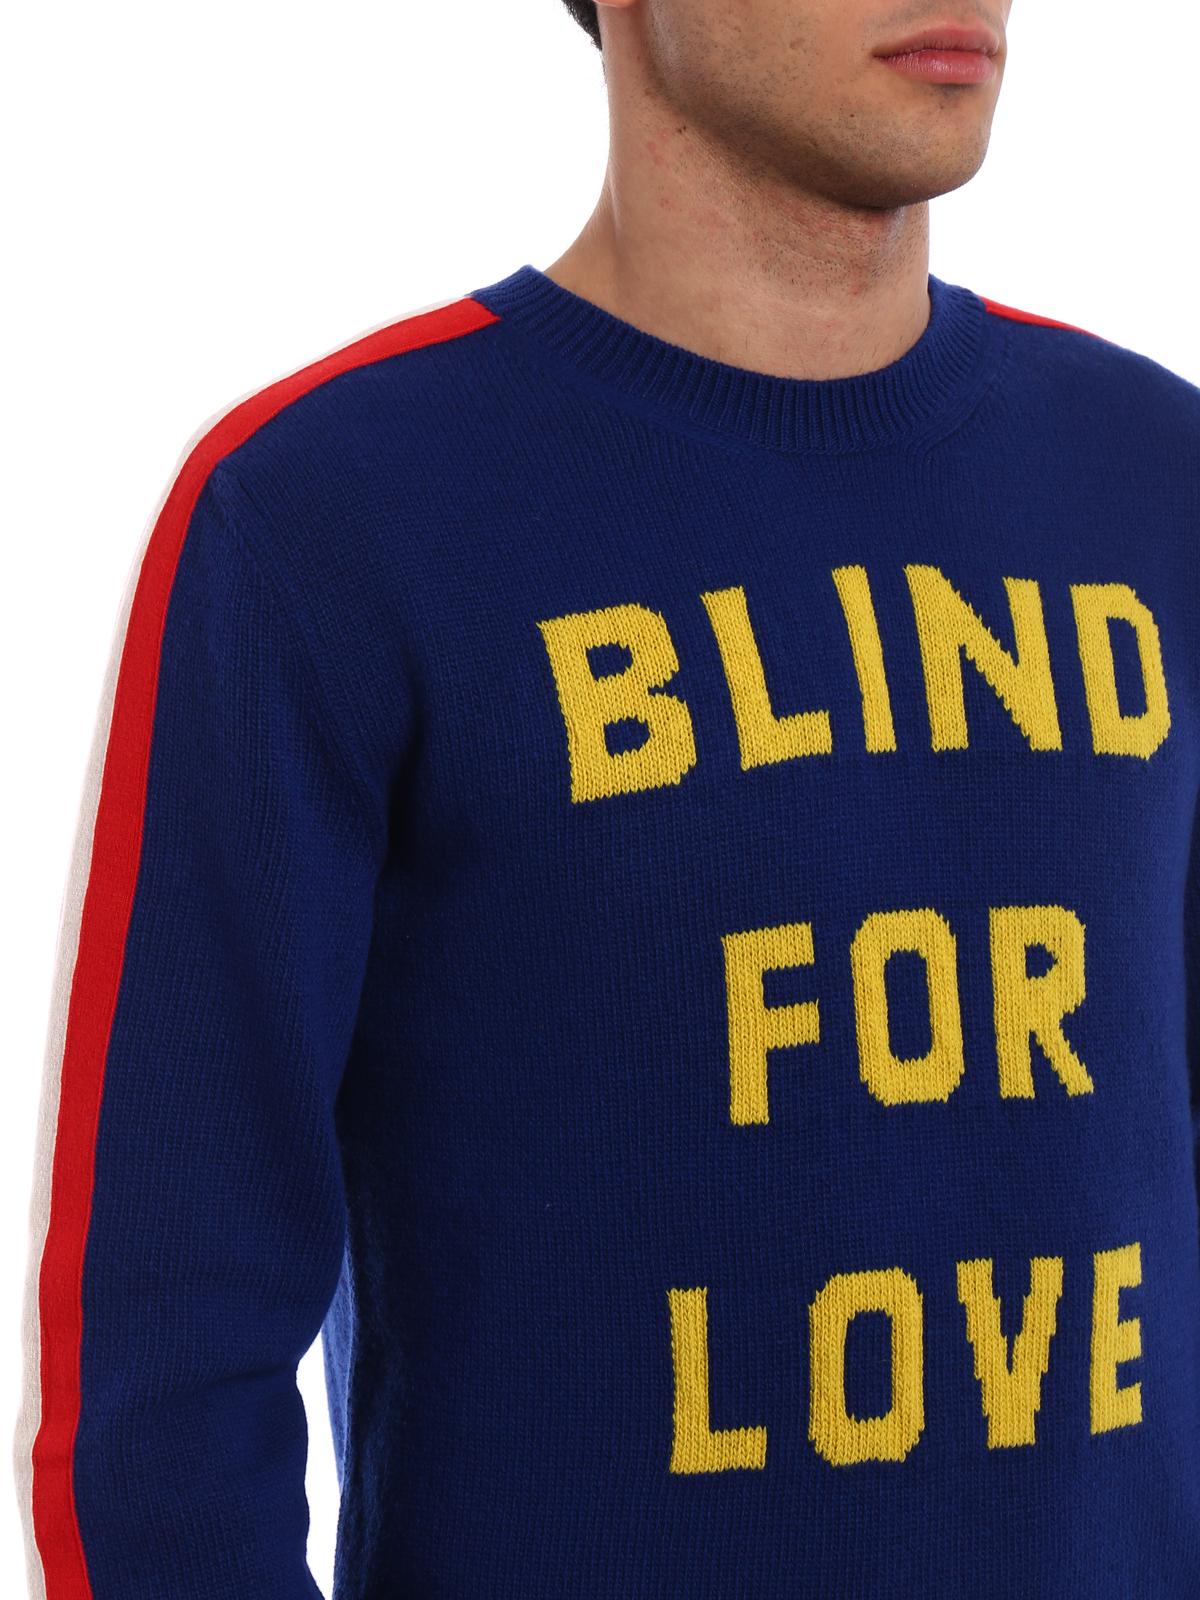 461c90c3f Gucci - Blind For Love intarsia sweater - crew necks - 496686X9I824166